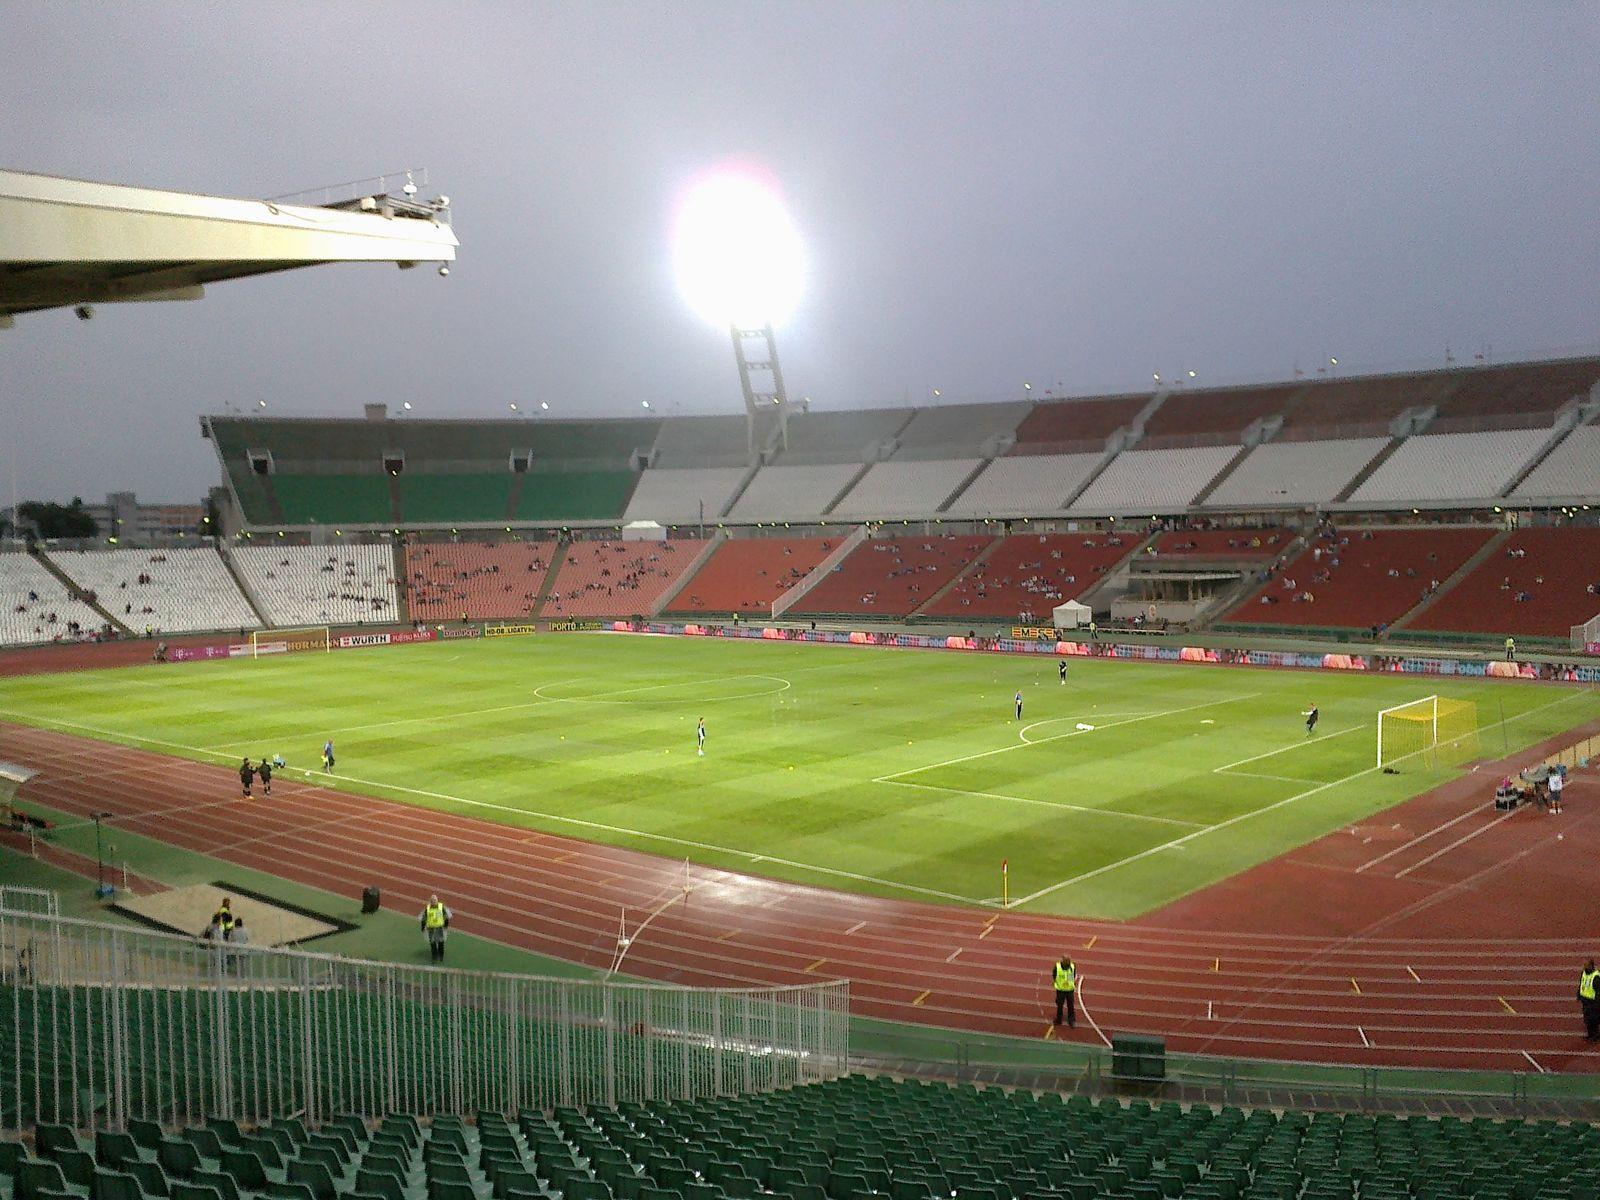 Puskás Ferenc Stadion – StadiumDB